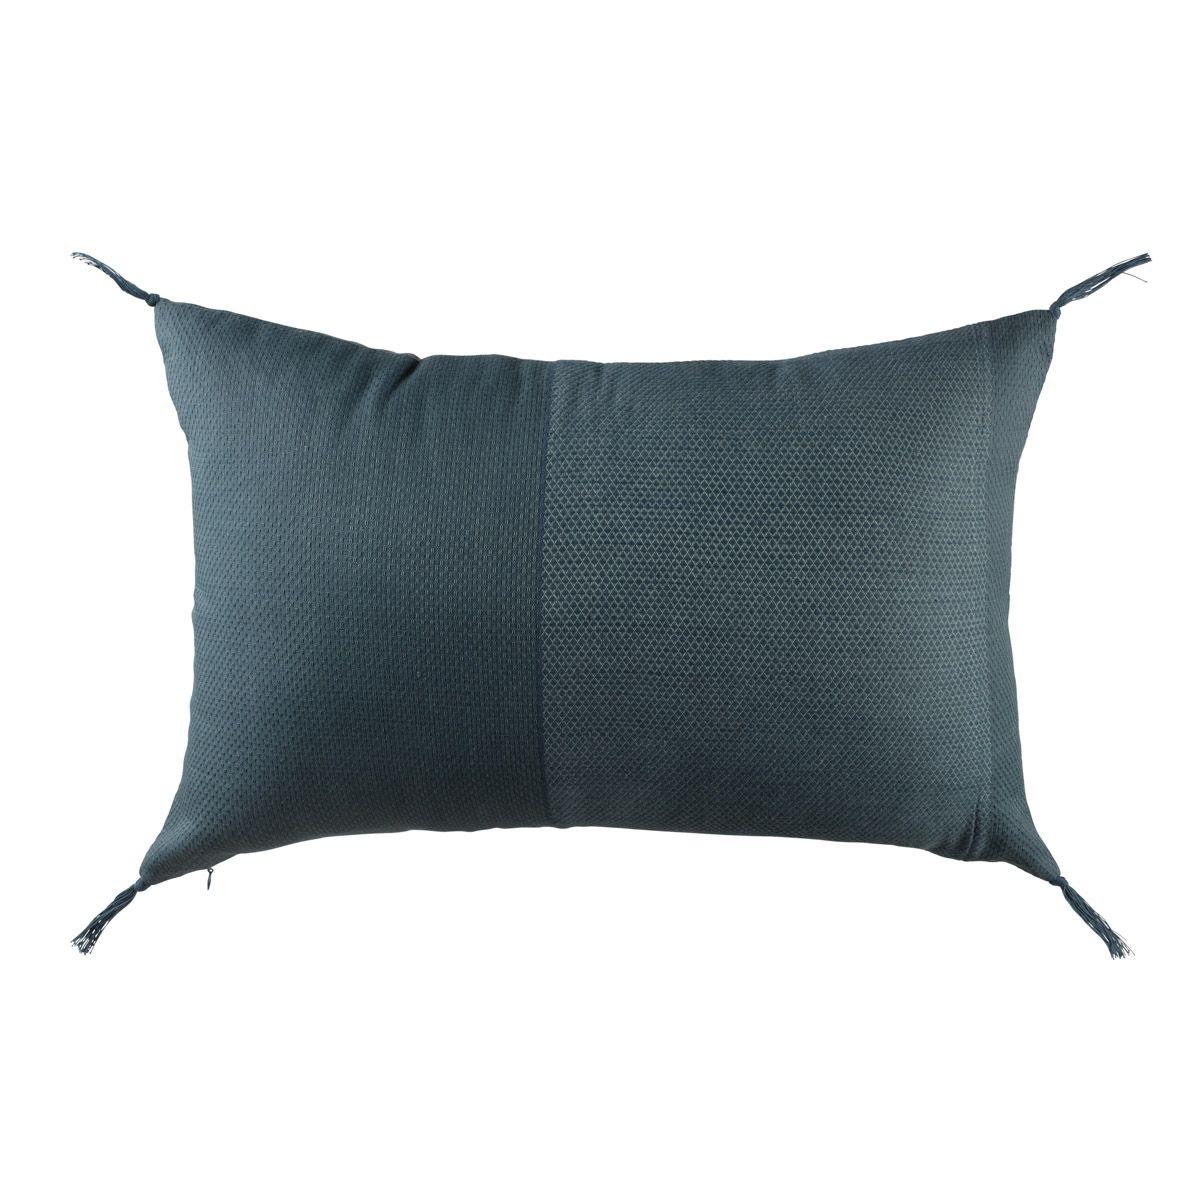 Coussin rectangulaire 35 x 50 cm bleu ROMA